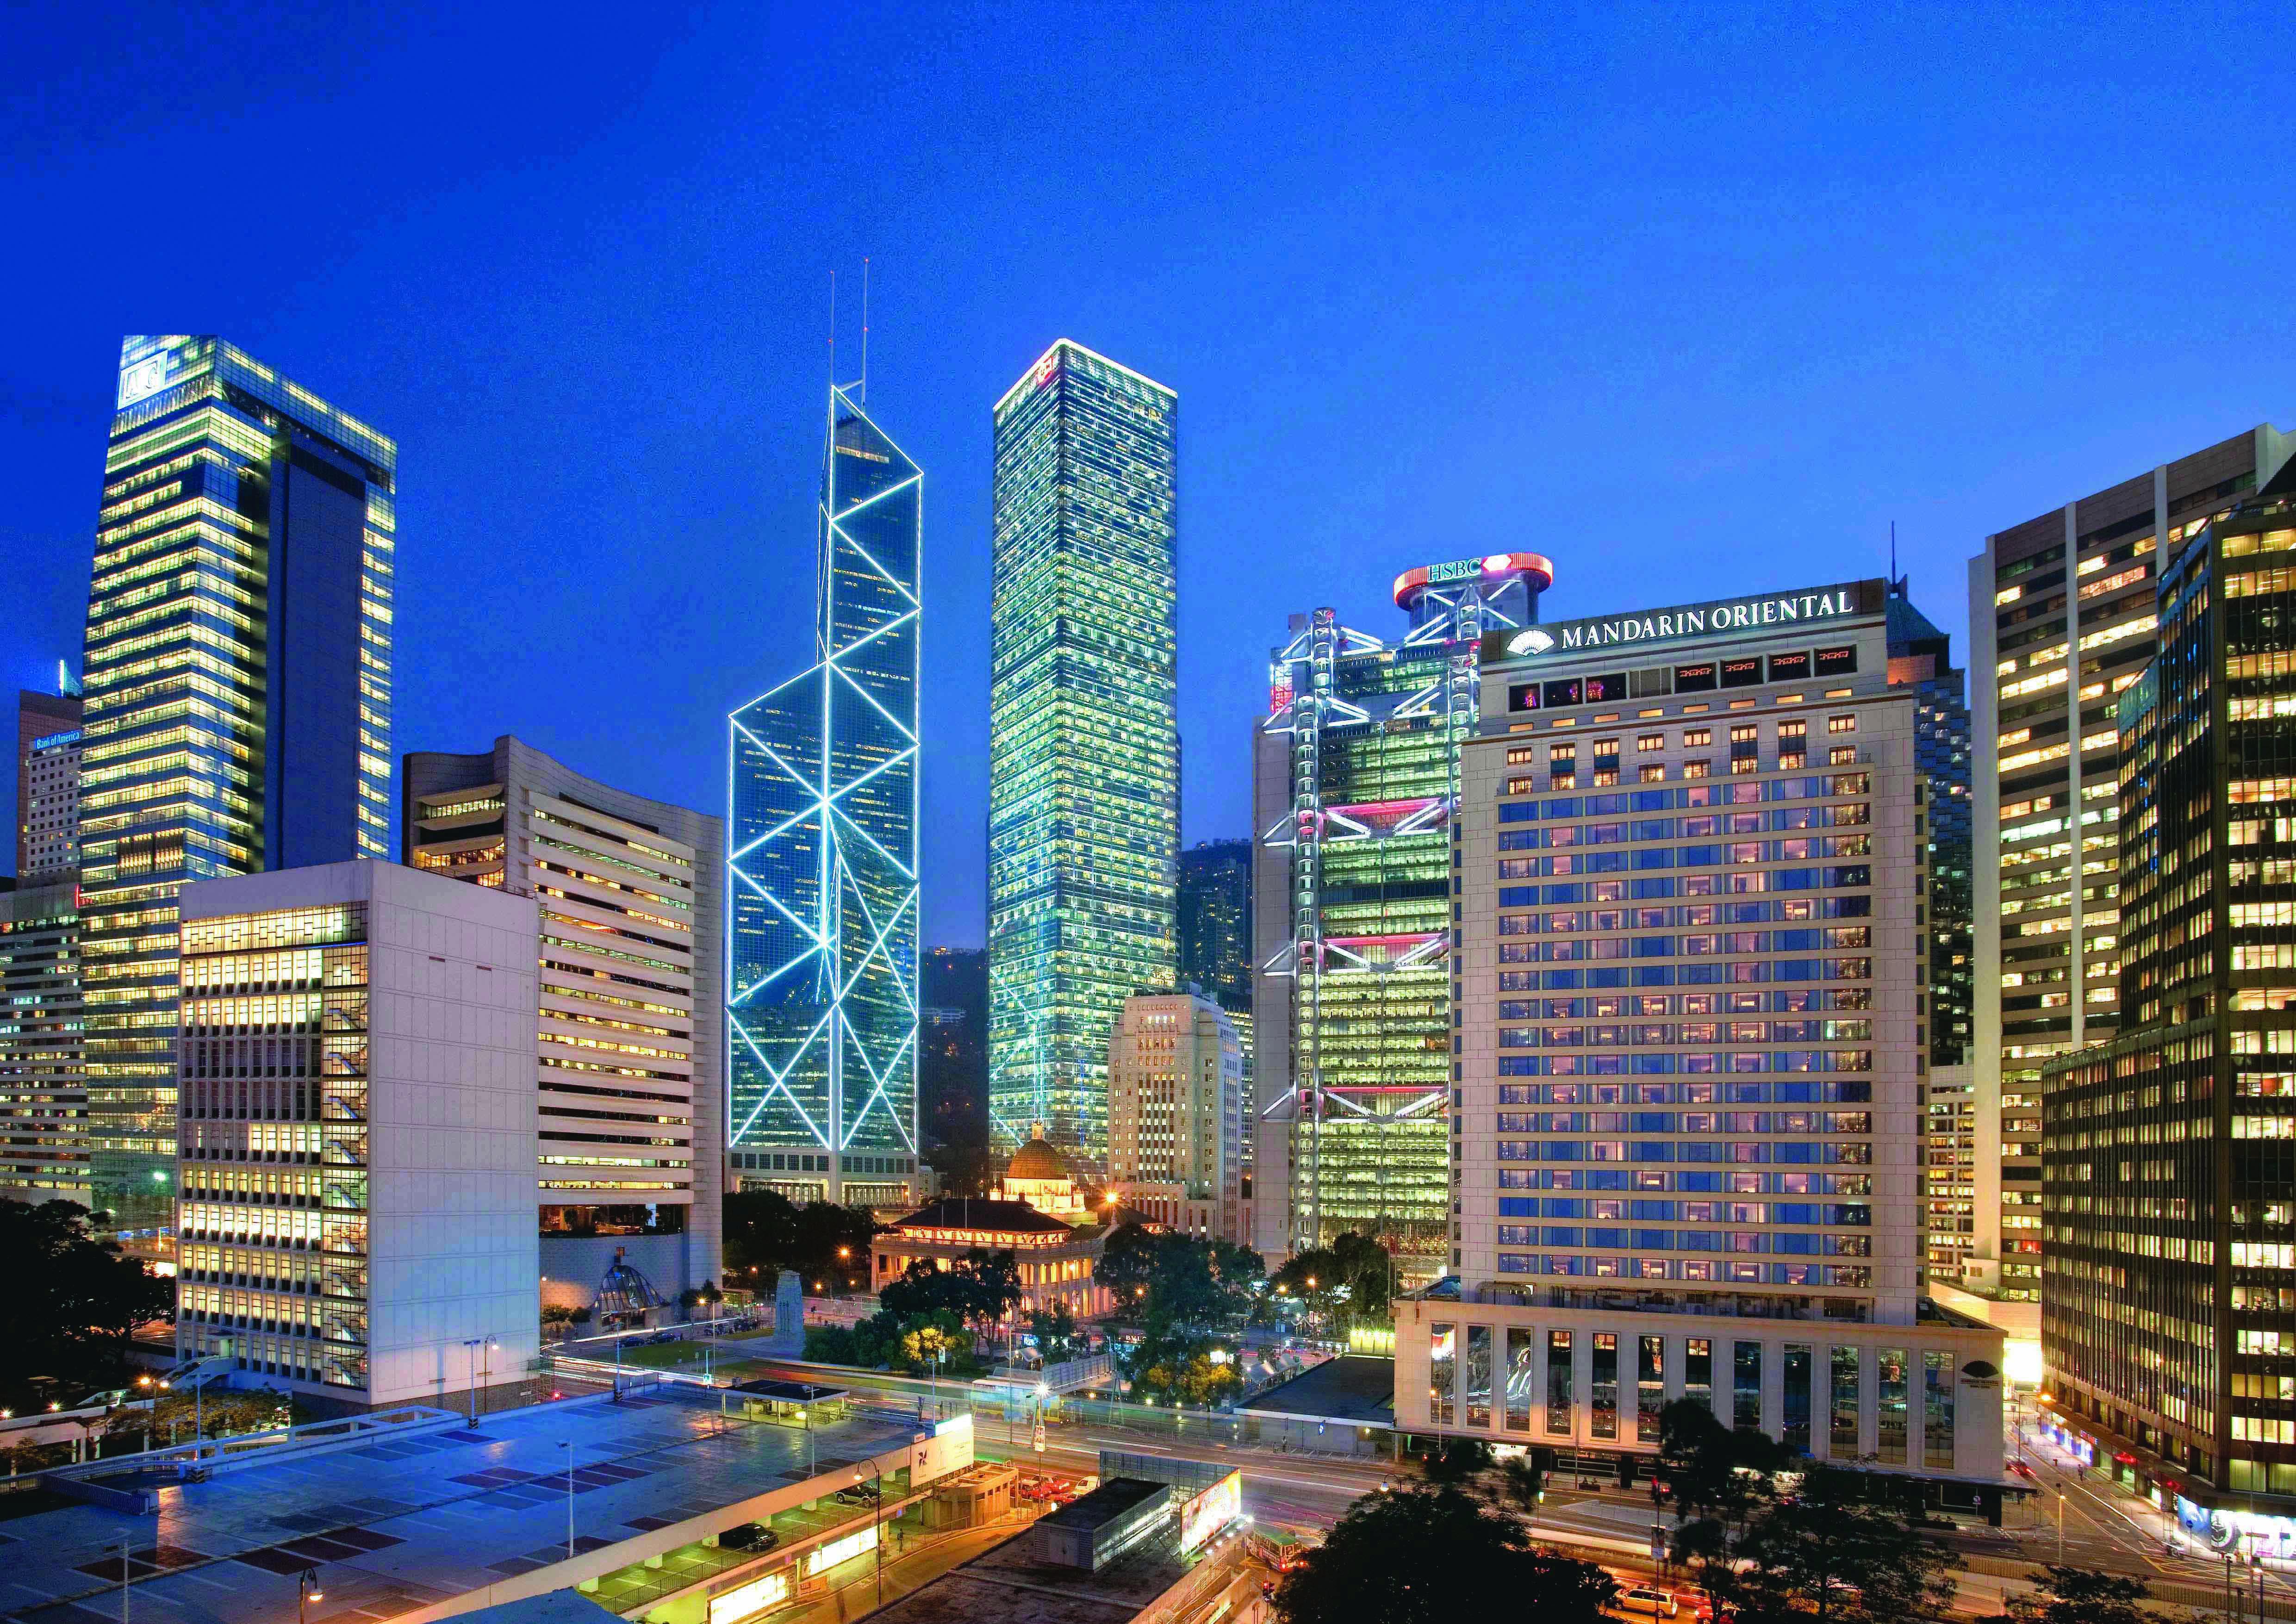 Mandarin Oriental, Hong Kong - Exterior at Dusk (High Res)